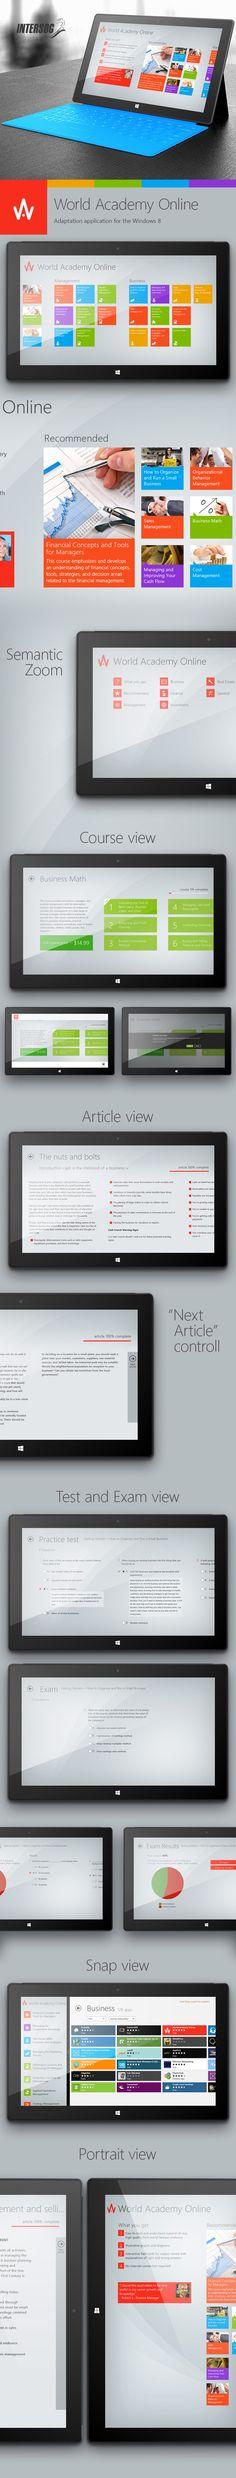 World Academy Online for Windows 8 (Adaptation app for the Windows 8 Modern UI) by Mikhail Nagliy